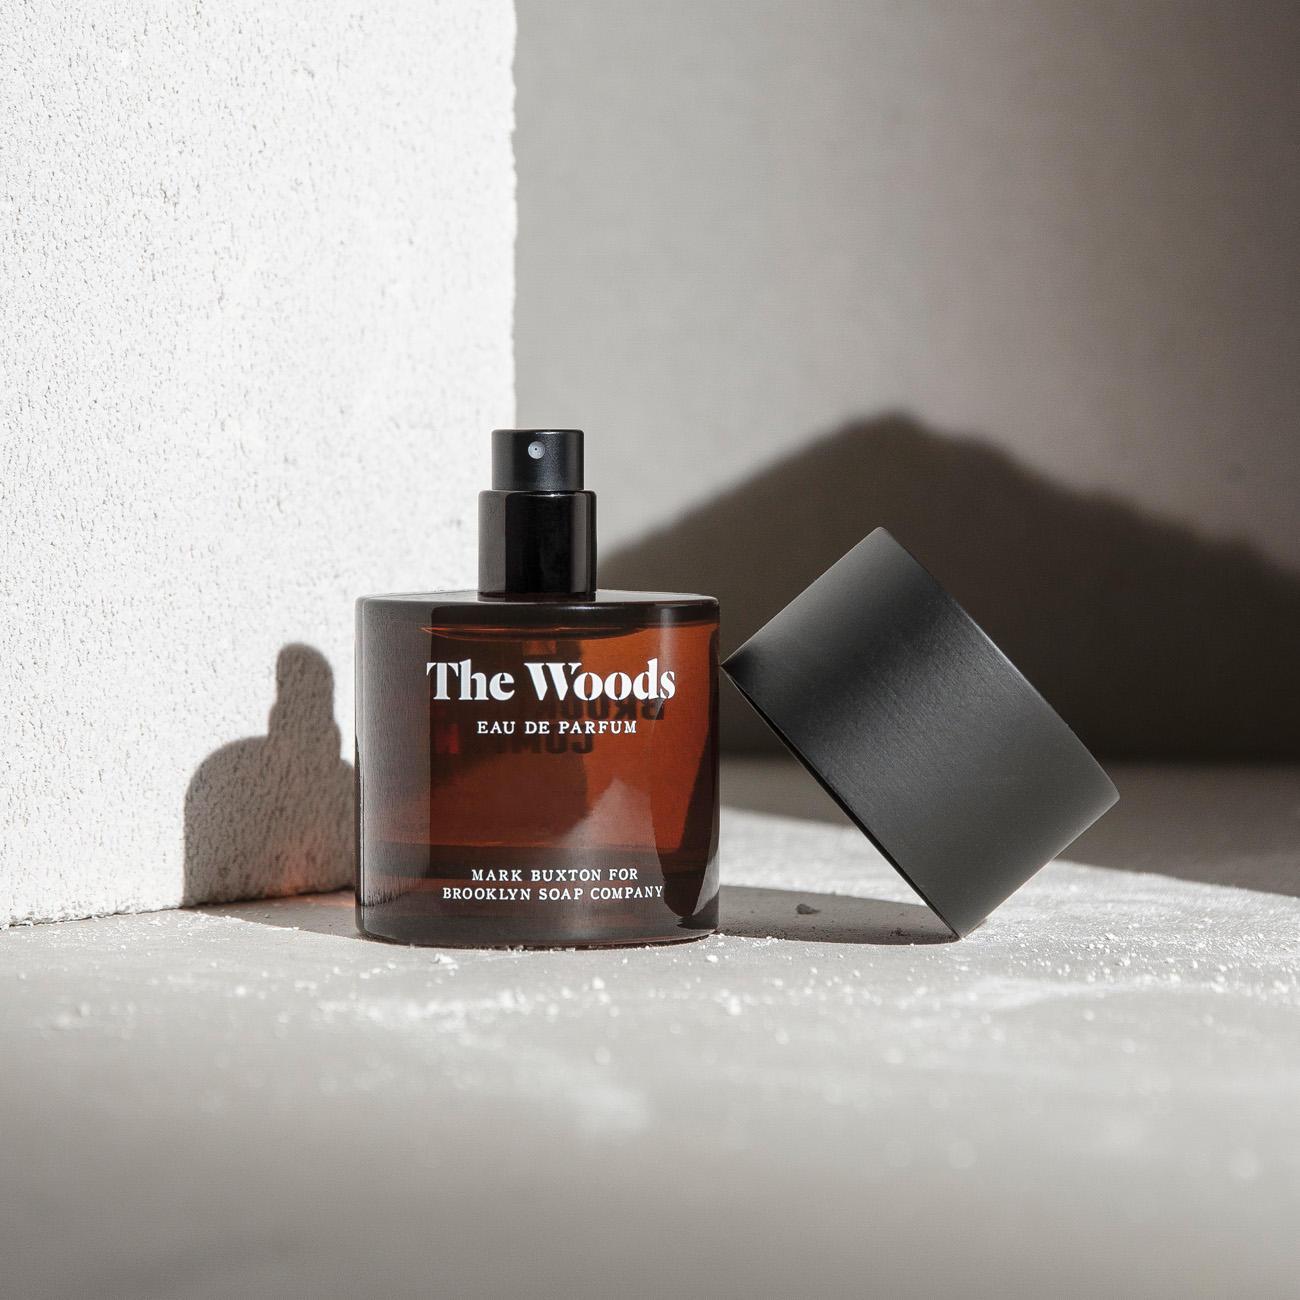 The Woods Eau De Parfum 3 Jahre Garantie Pro Idee